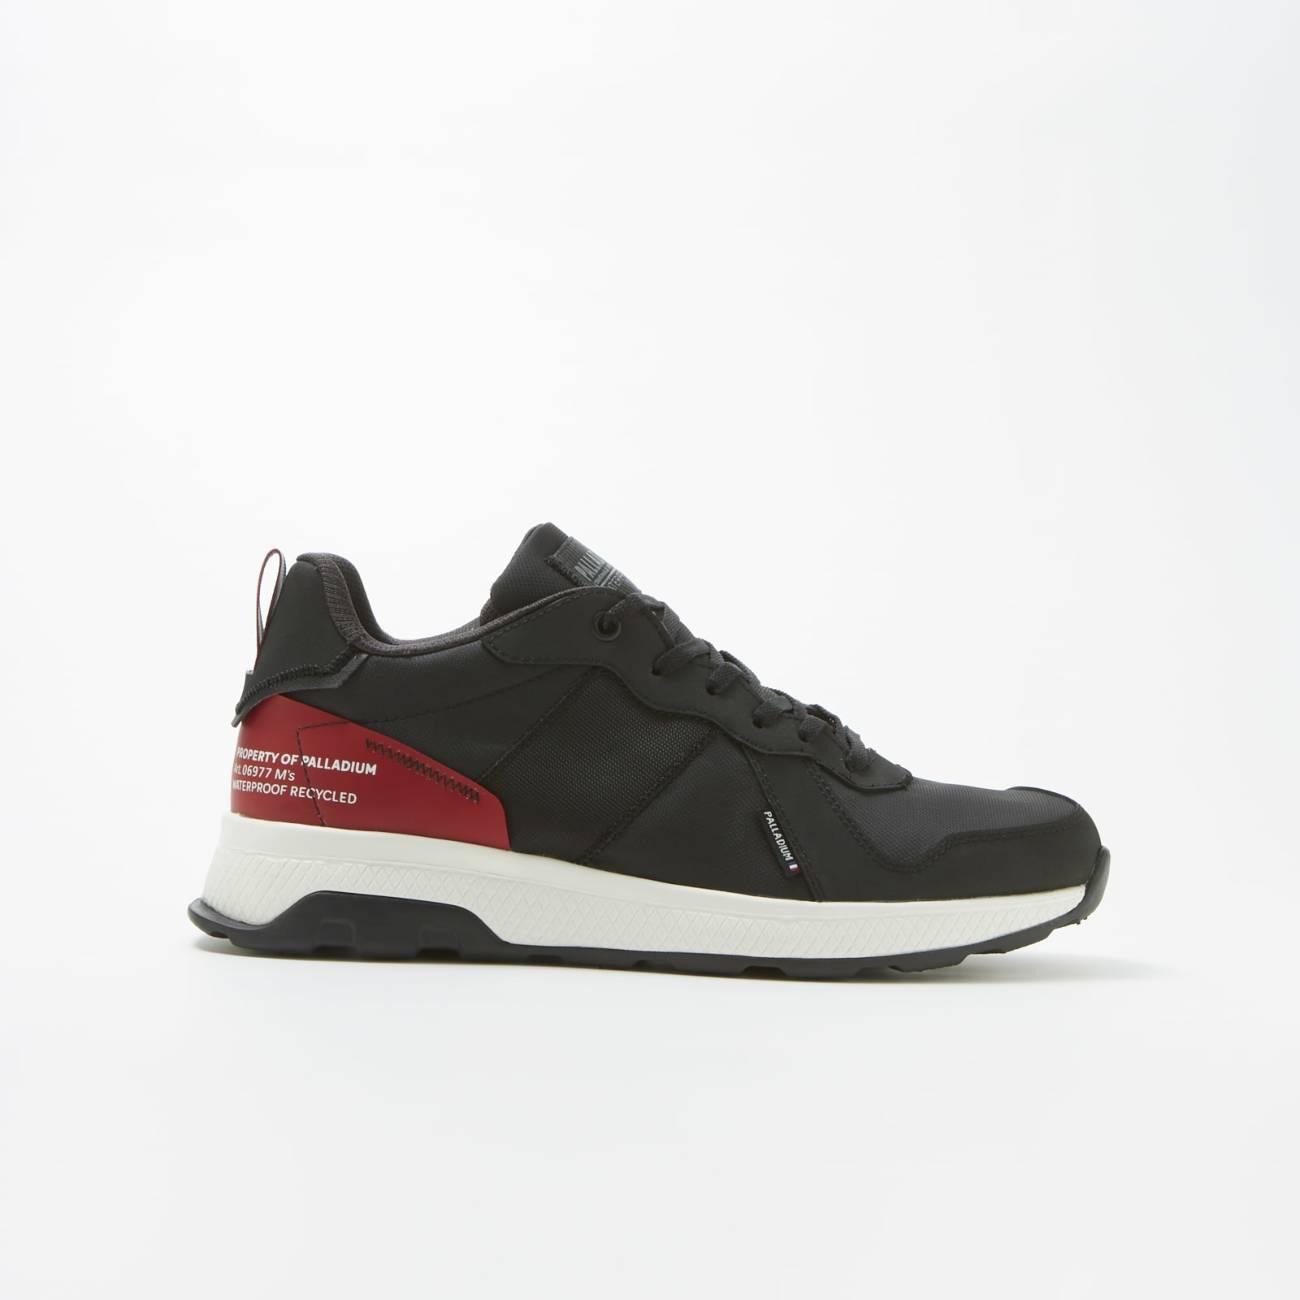 S-Rush(エスラッシュ)[PALLADIUM(パラディウム)]AXEON WP+RCY 黒/白/赤